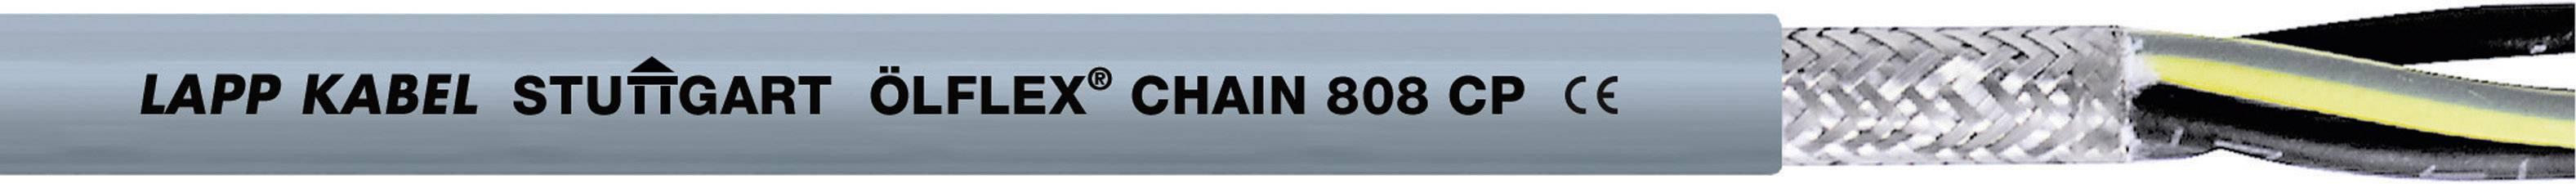 Žíla kabelu LappKabel ÖLFLEX CHAIN 808 CP 3G2,5 (1027783), 3x 2,5 mm², polyurethan, Ø 9 mm, stíněný, 50 m, šed